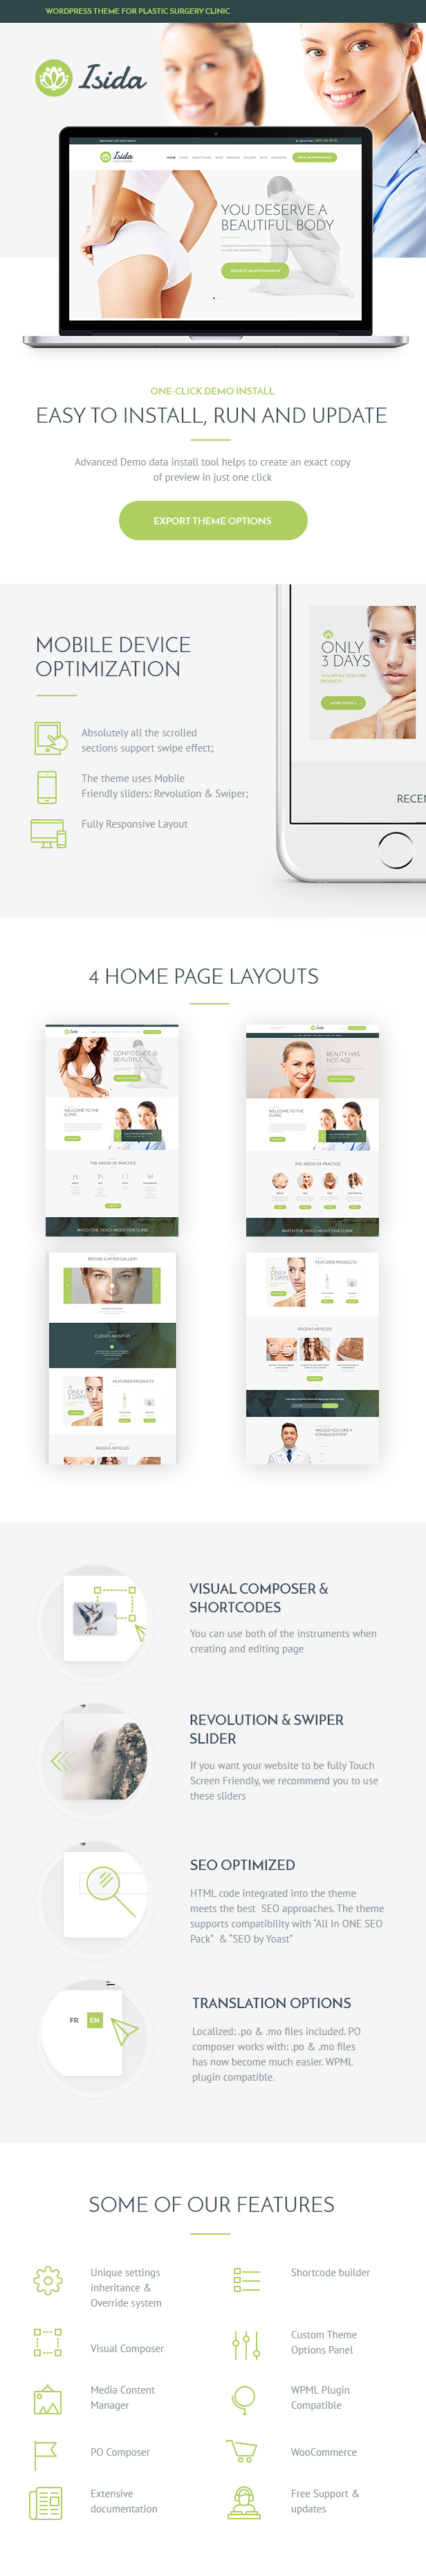 Isida - Plastic Surgery Clinic | Medical WordPress Theme - 2